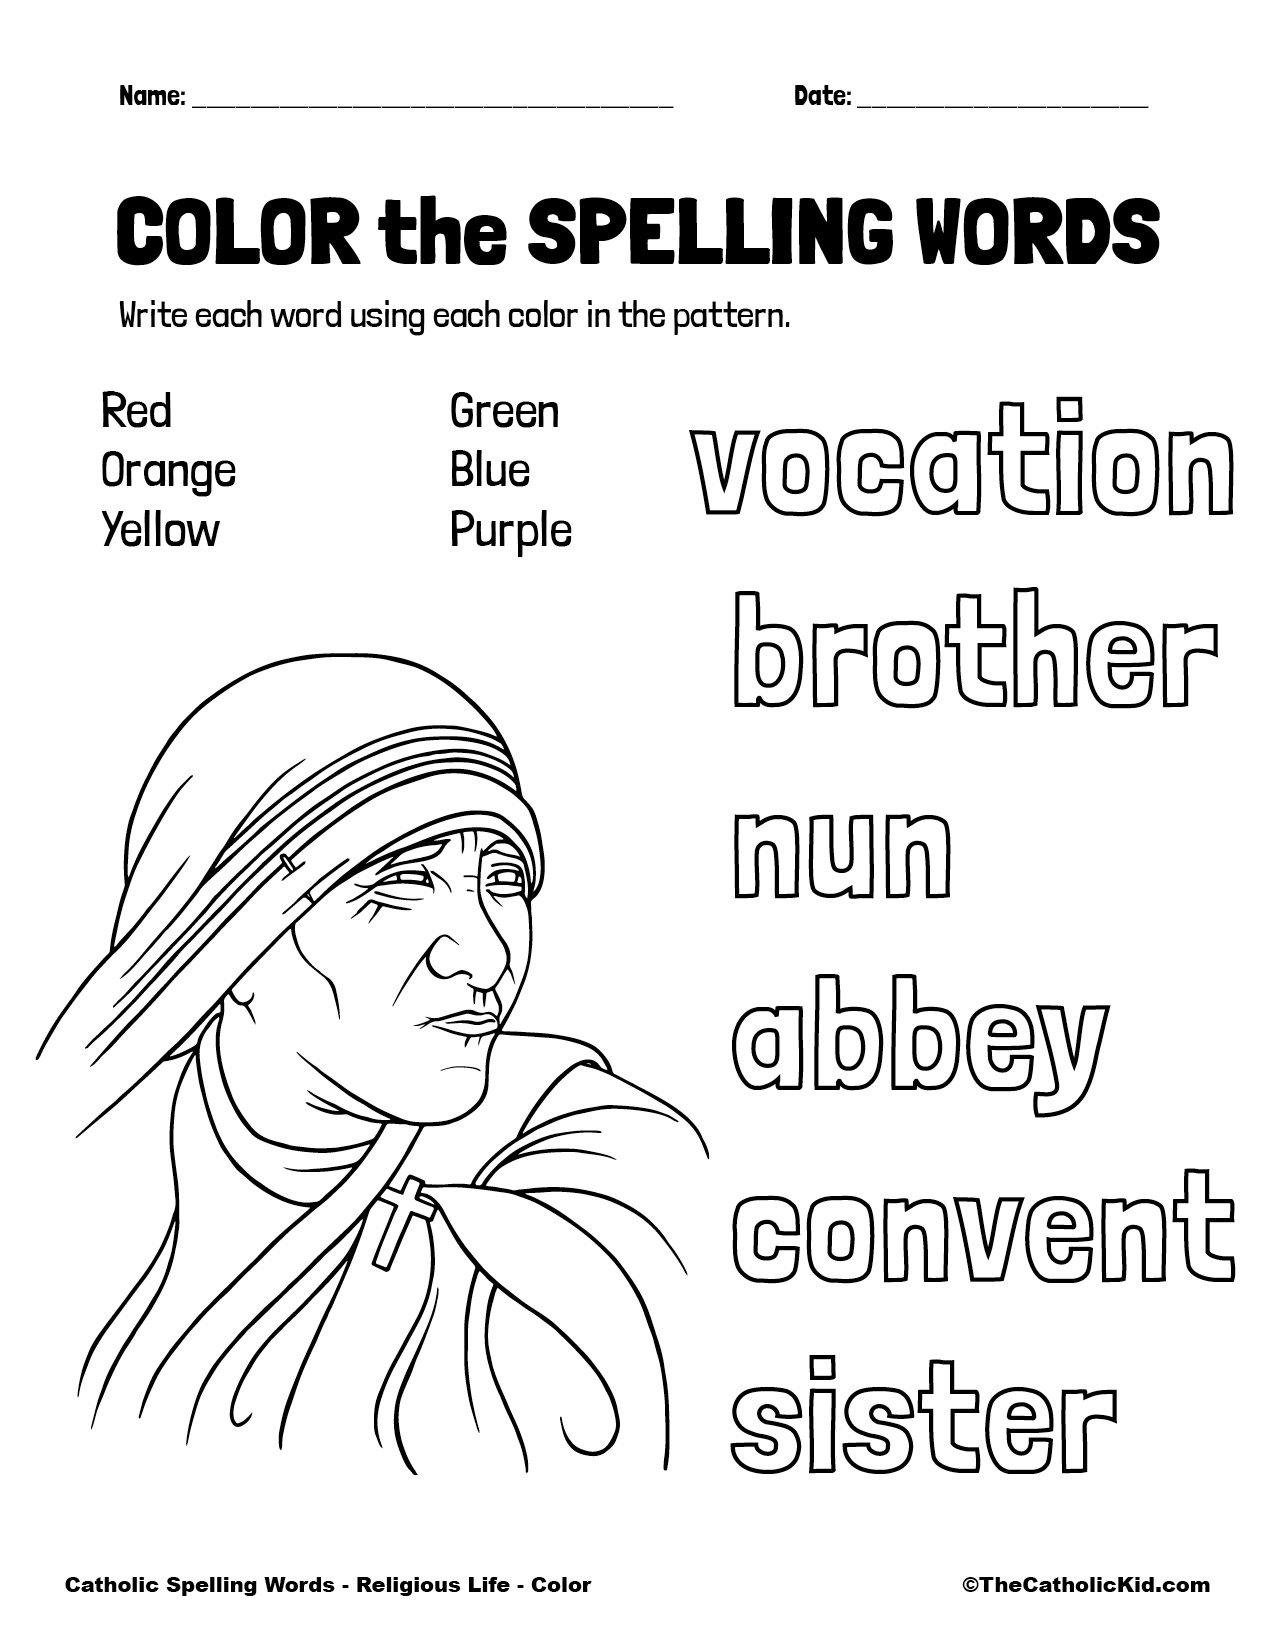 Catholic Spelling & Vocabulary Words Religious Life Worksheet 1 Color